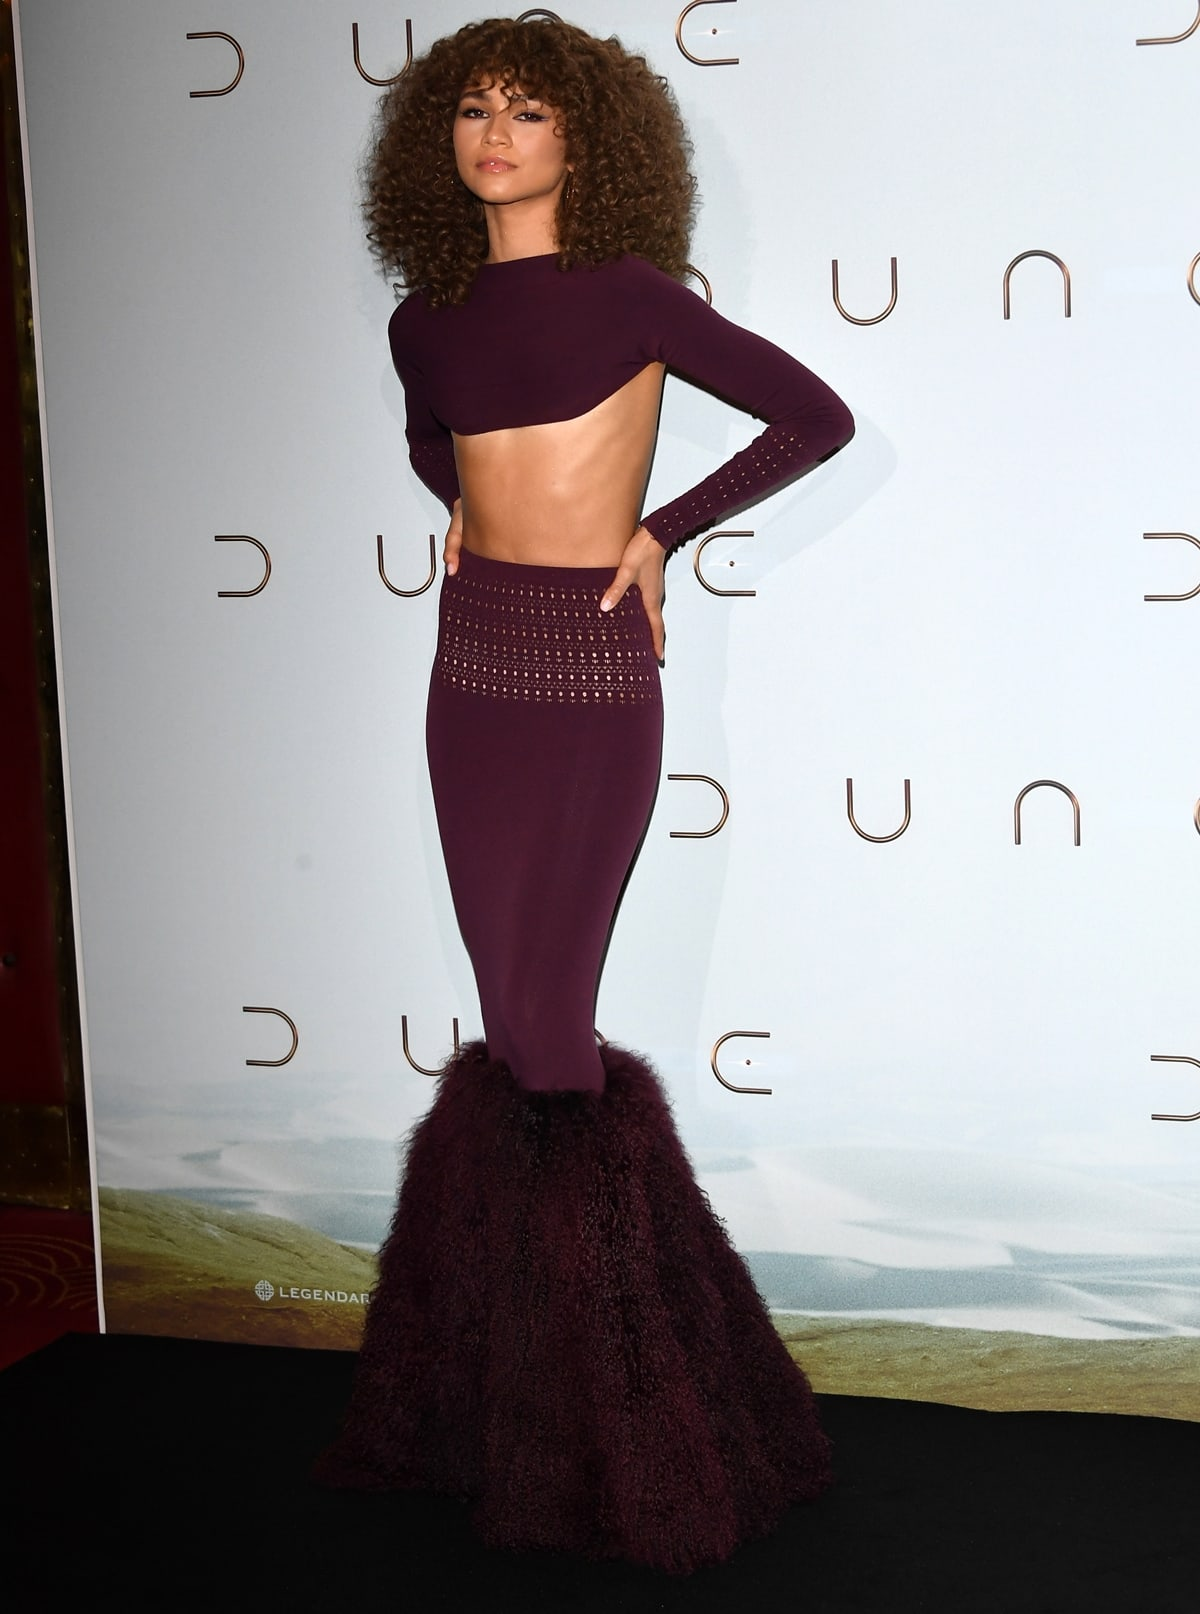 Zendaya in a tiny Alaïa high-cut long-sleeved top and bodycon skirt